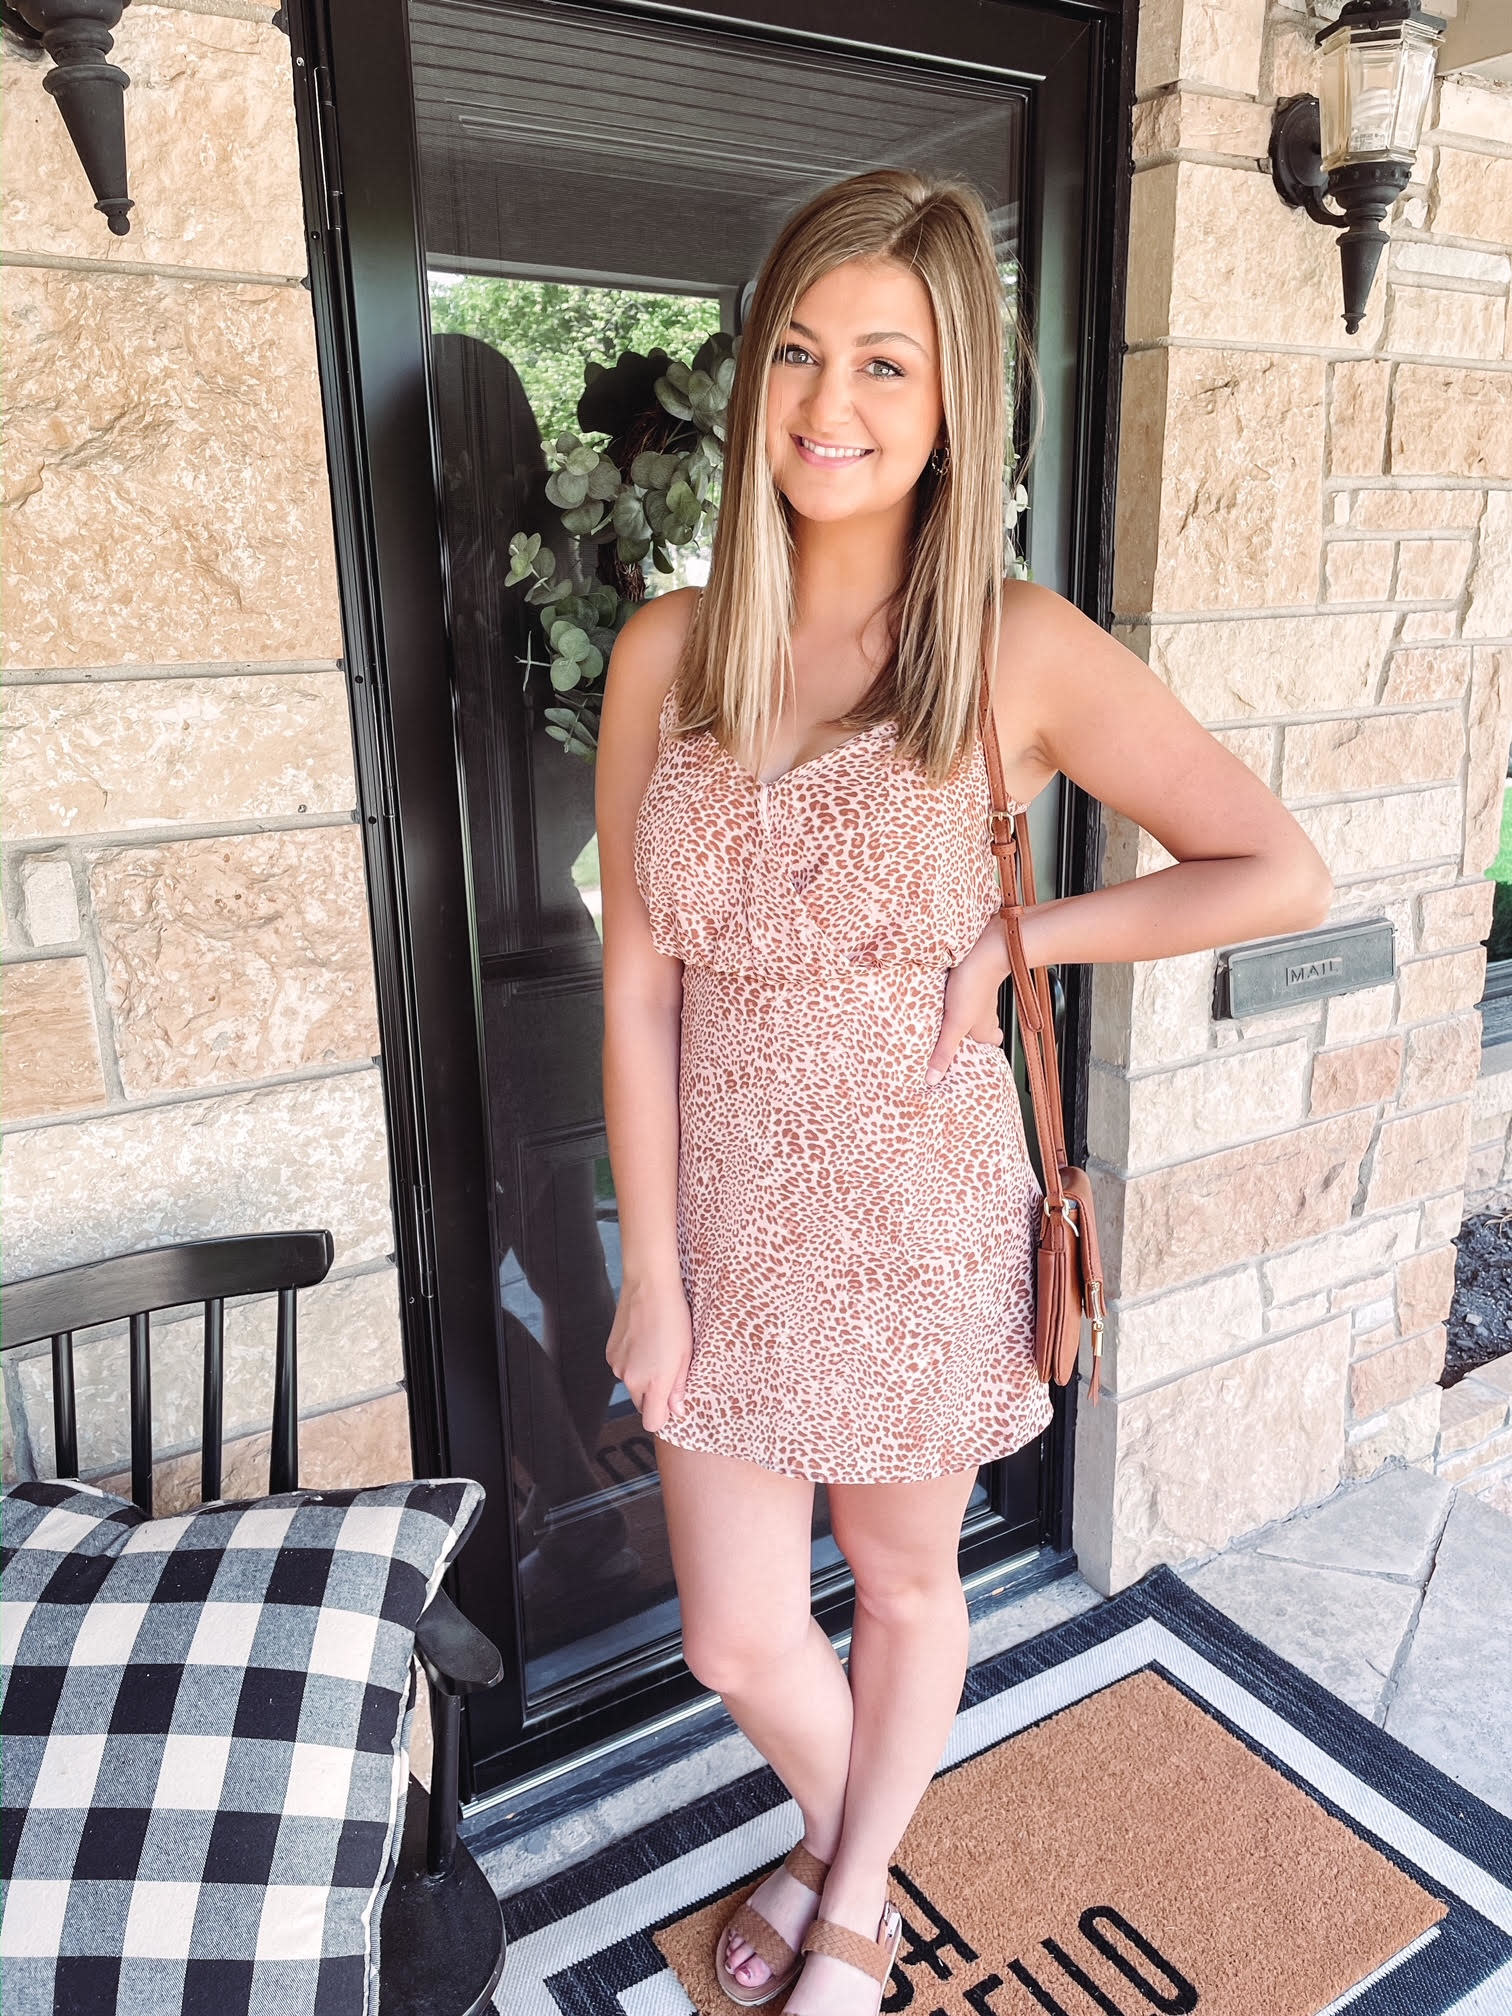 Abigail Leopard Dress